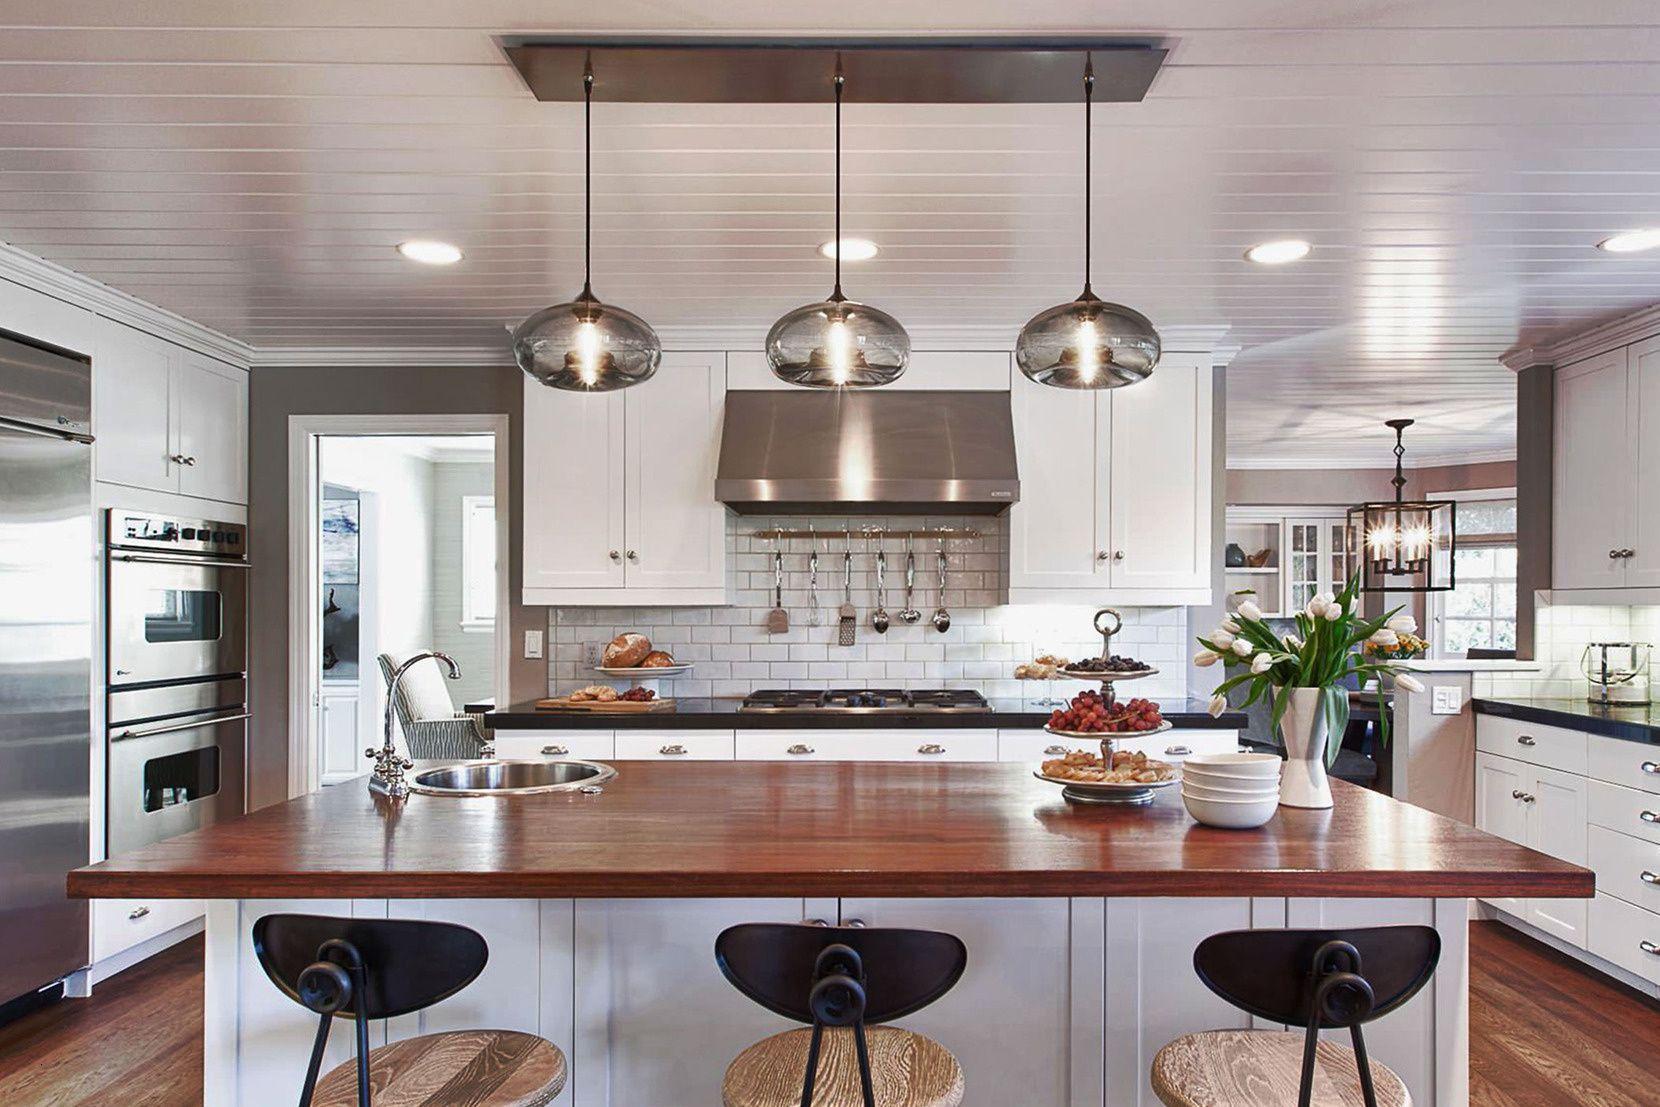 Light Fixtures Mesmerizing Home Depot Kitchen Renovation Trends Contemporary Kitchen Modern Kitchen Island